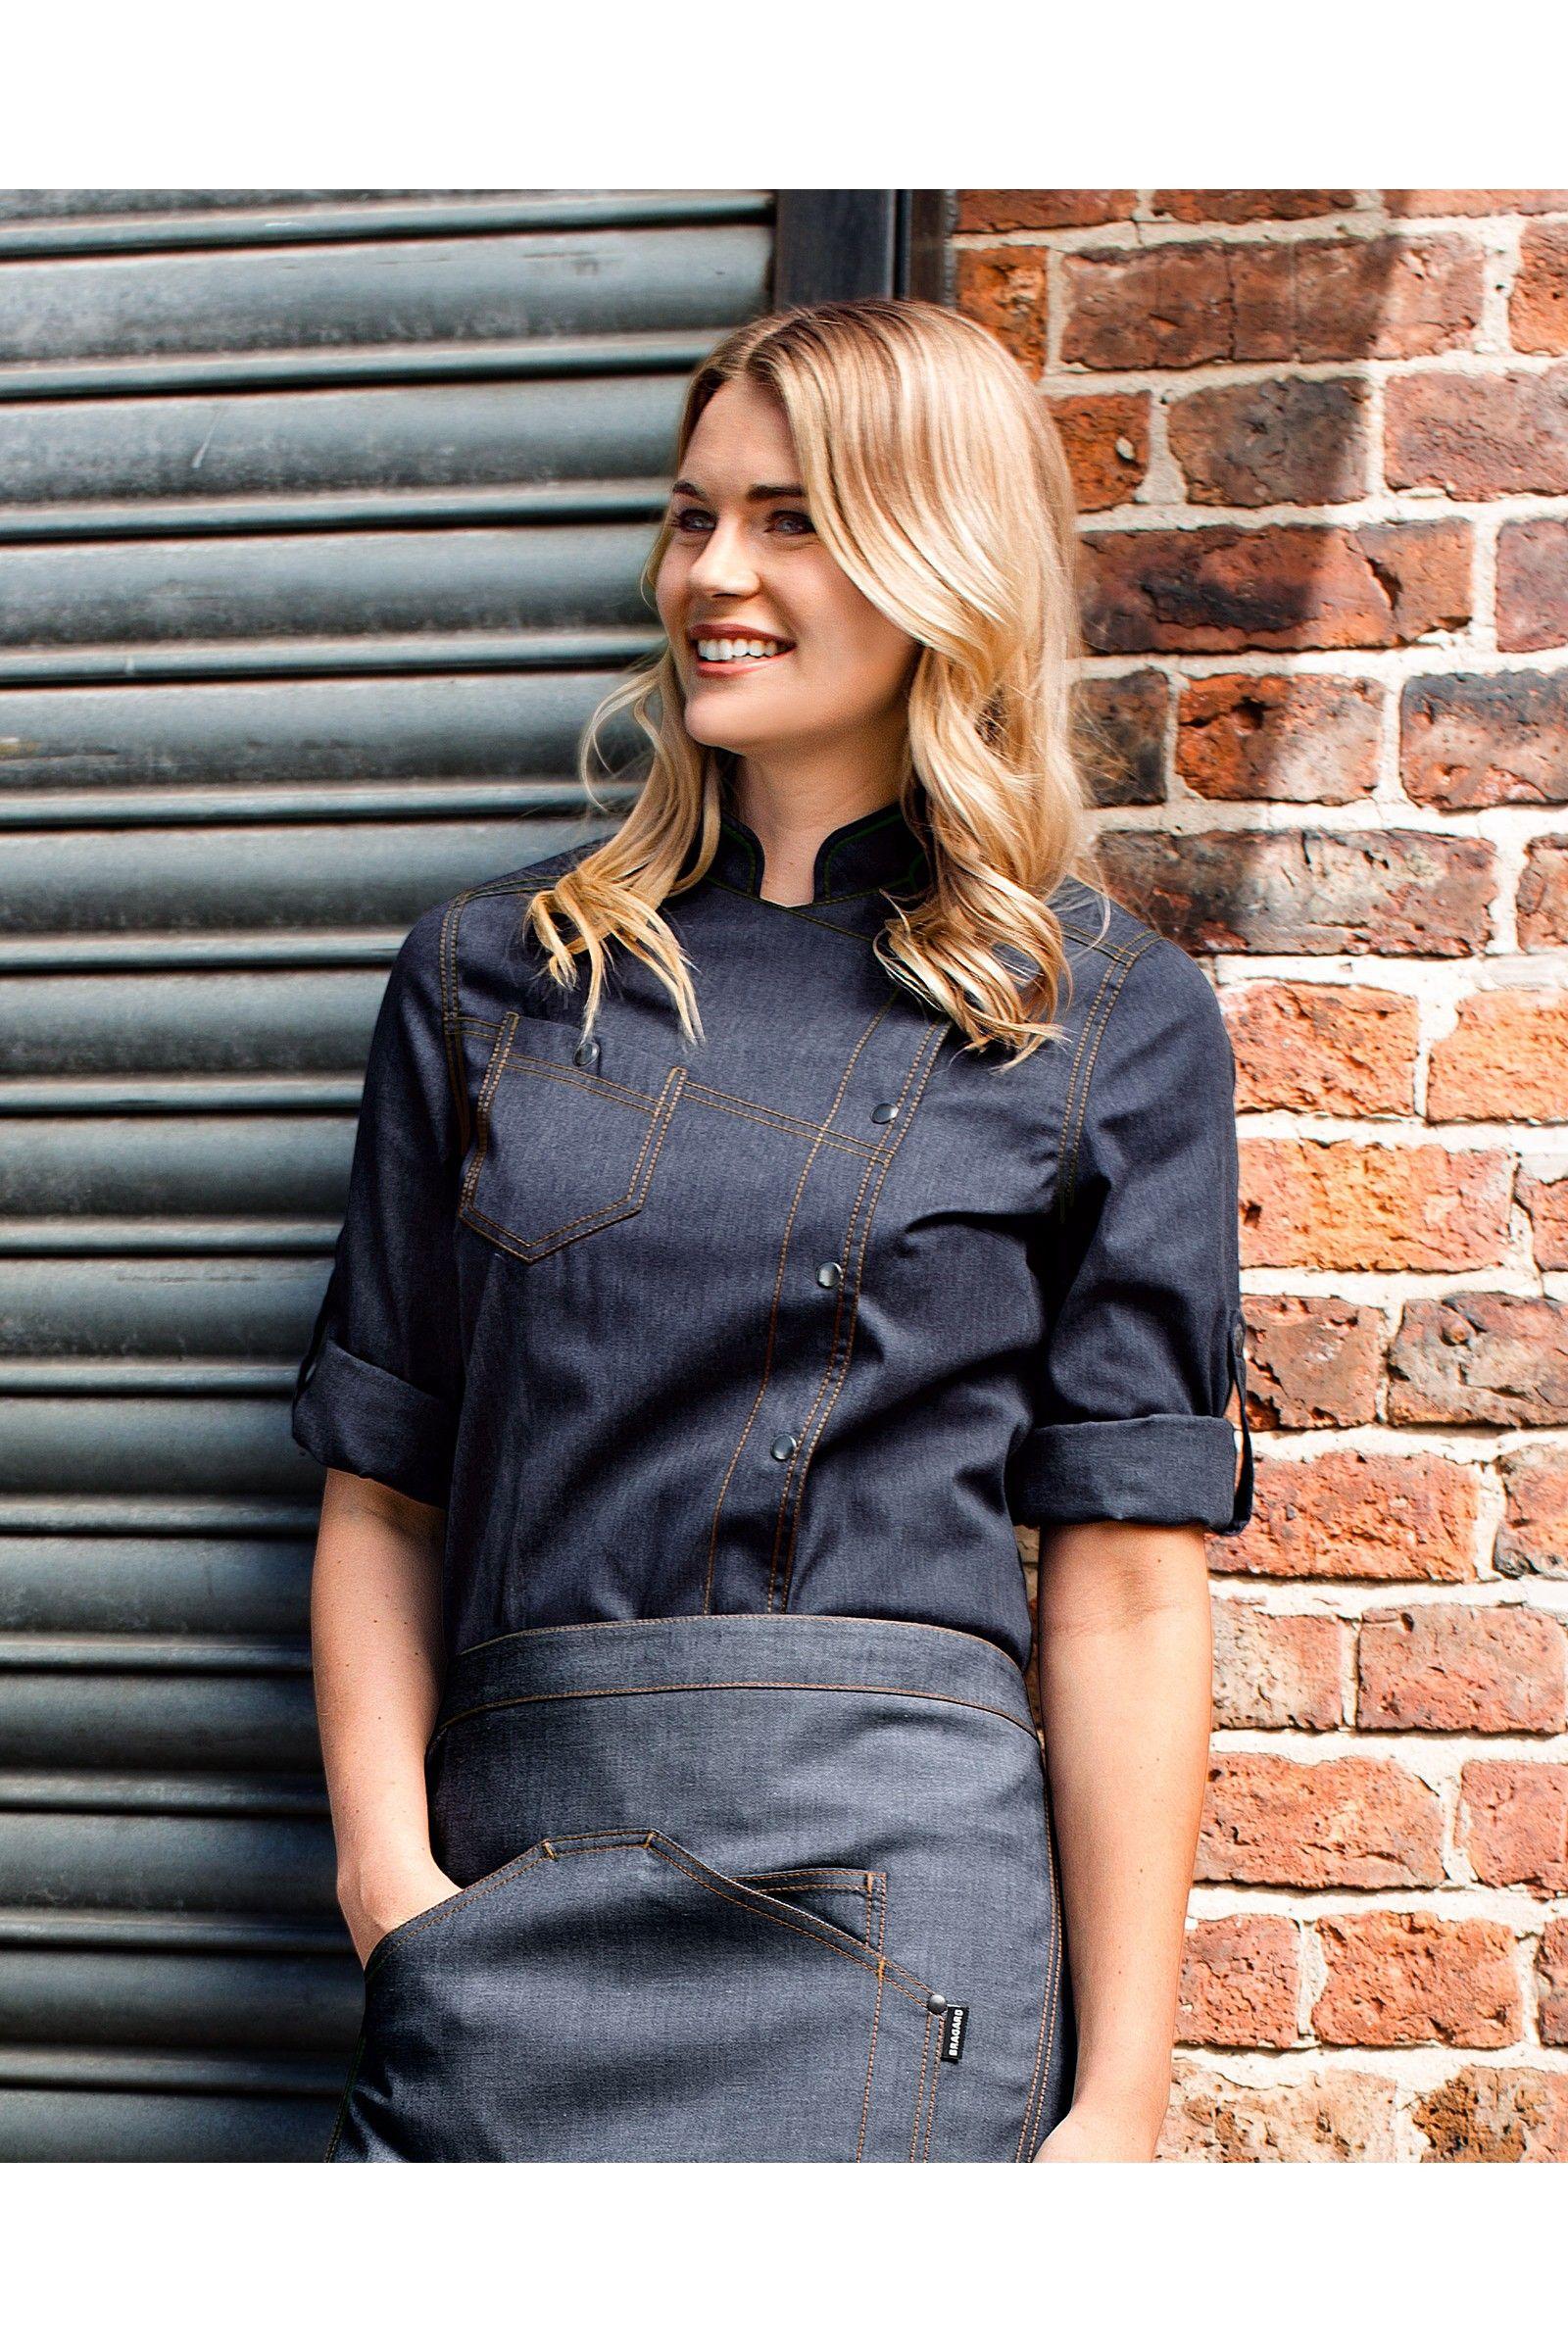 Denim chef jackets. Yes, I'm definitely liking the black and grey look